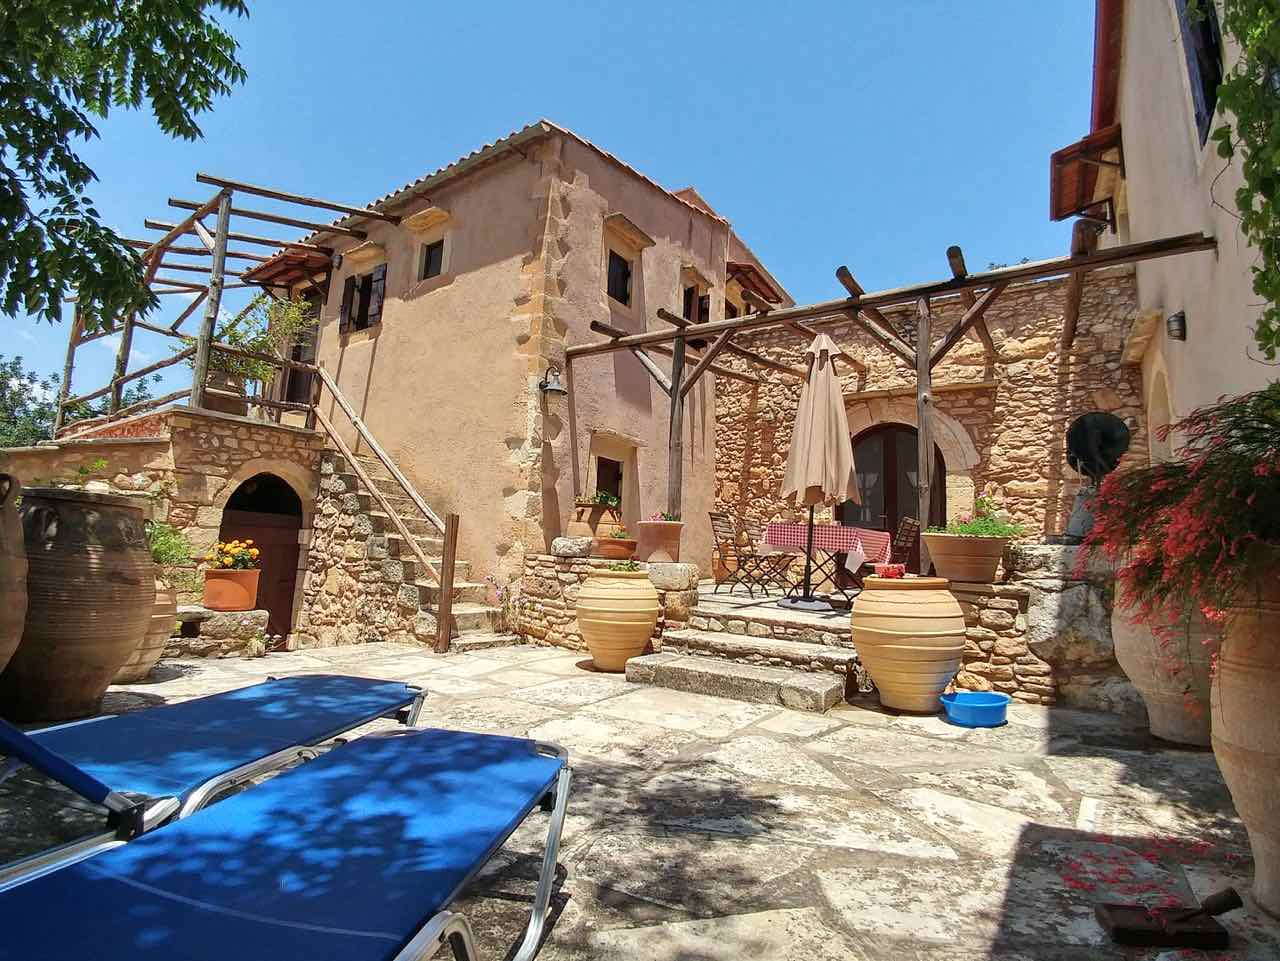 Hotel Of Day - Cretan Traditional Villas Gavalochori